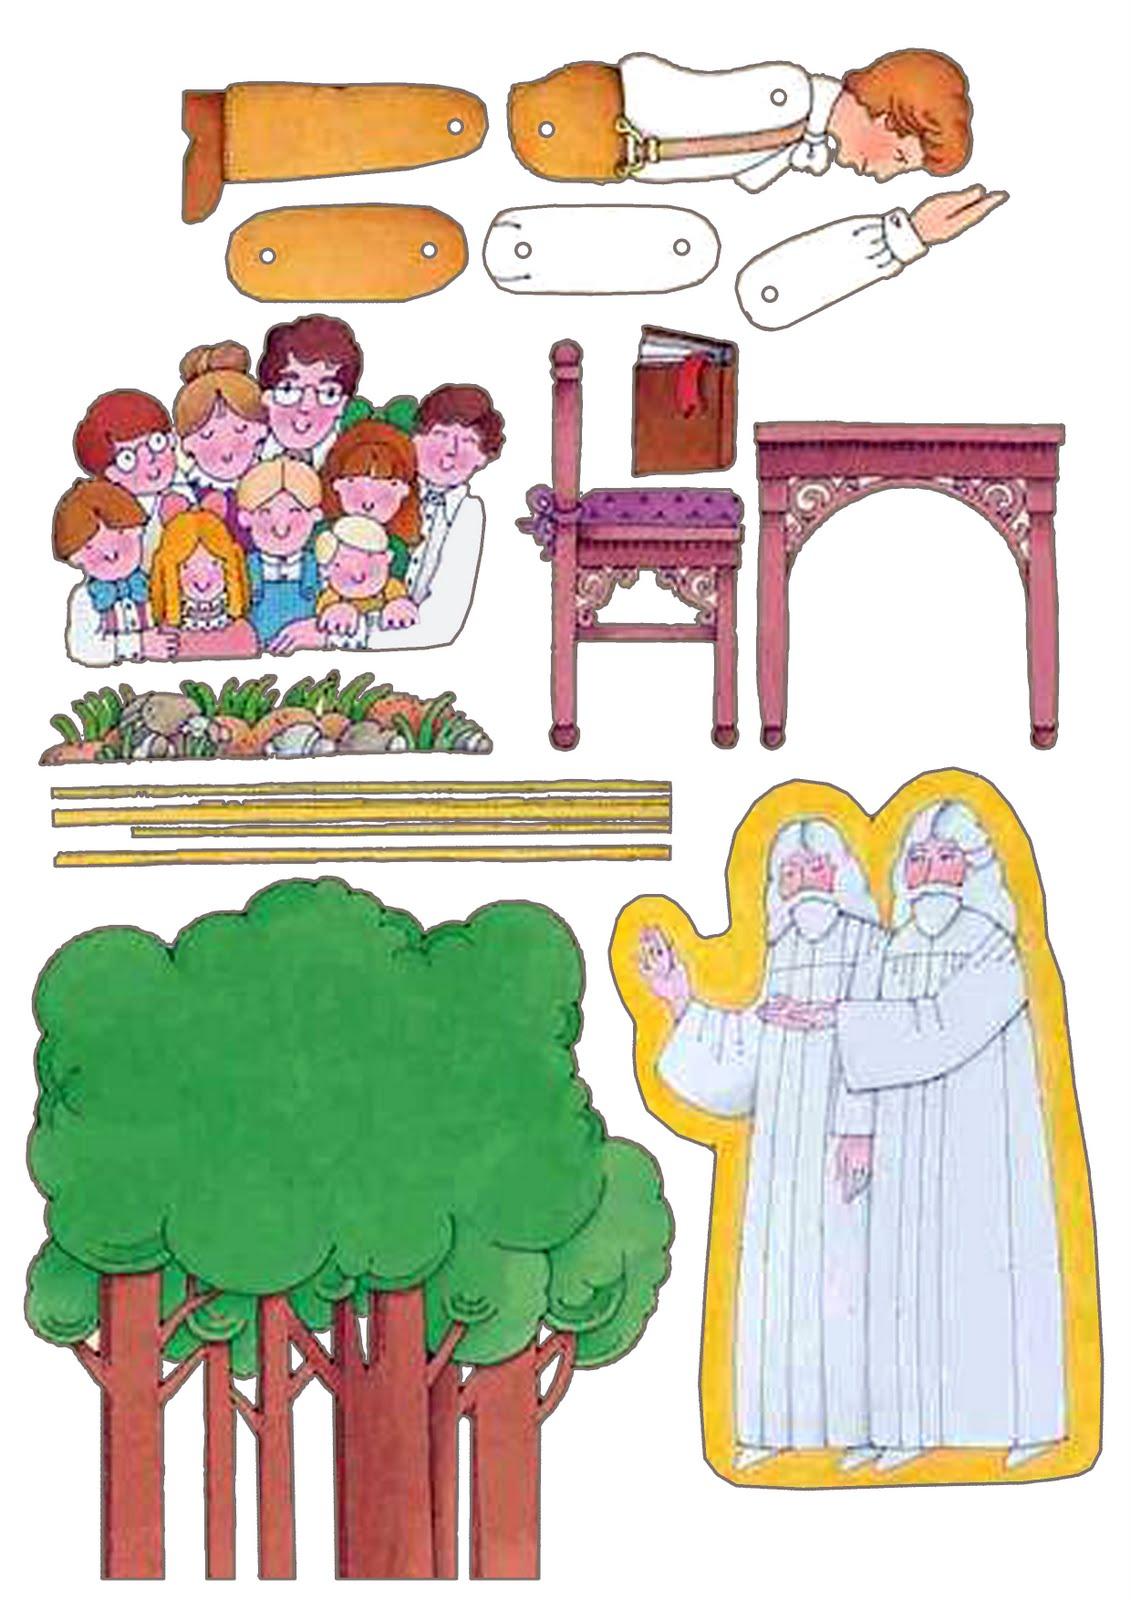 primera vision - La Iglesia de Jesucristo ha sido restaurada